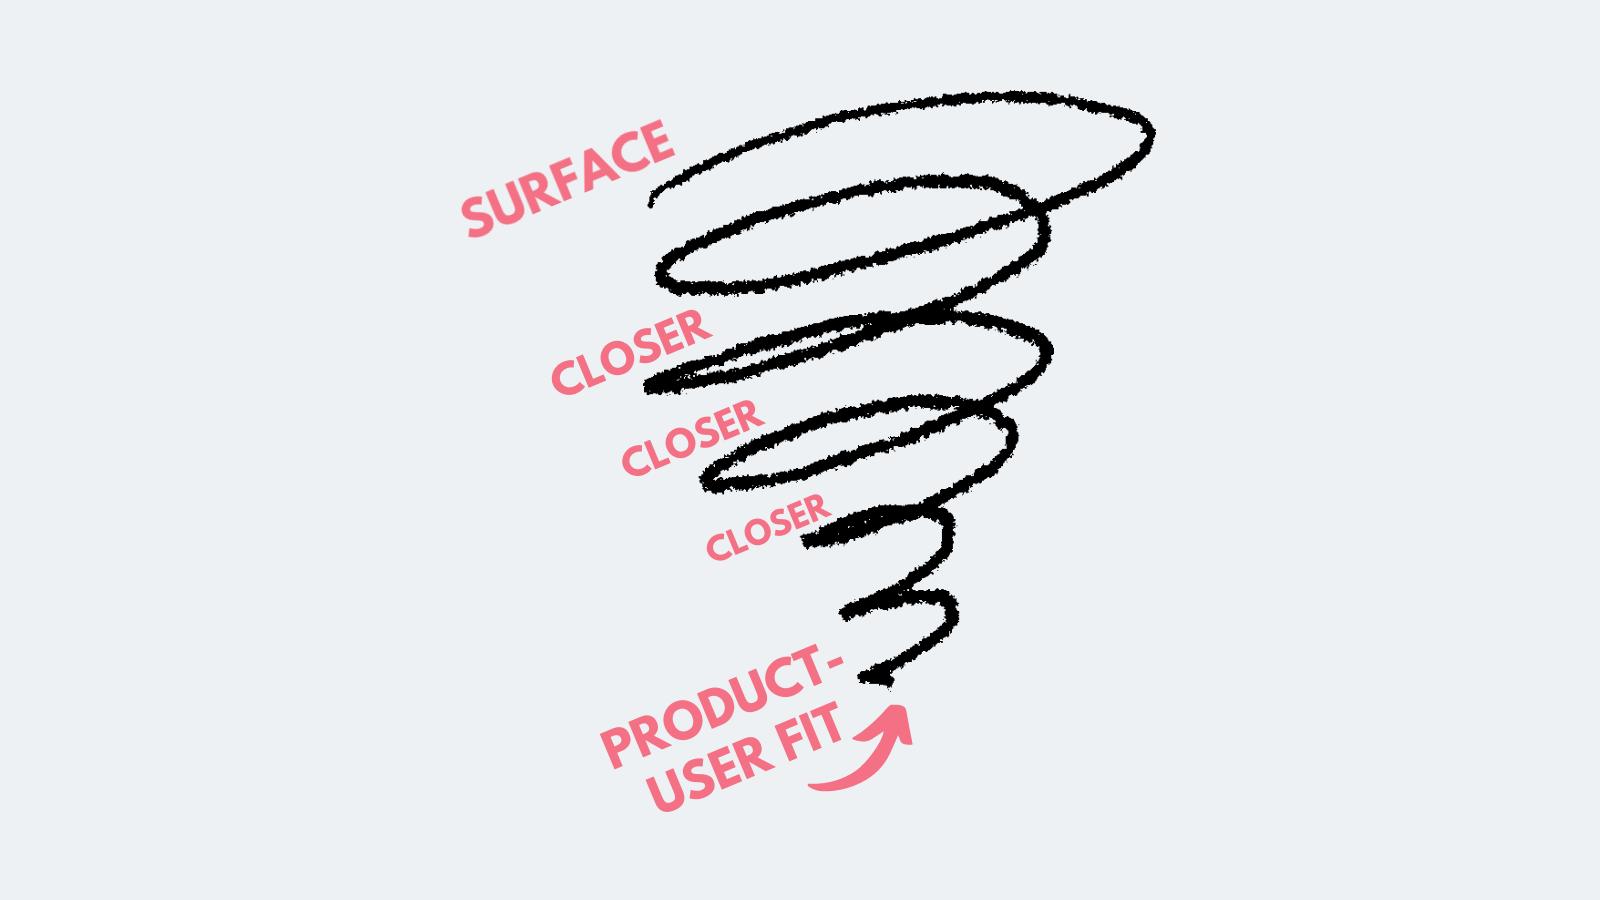 ux research process model